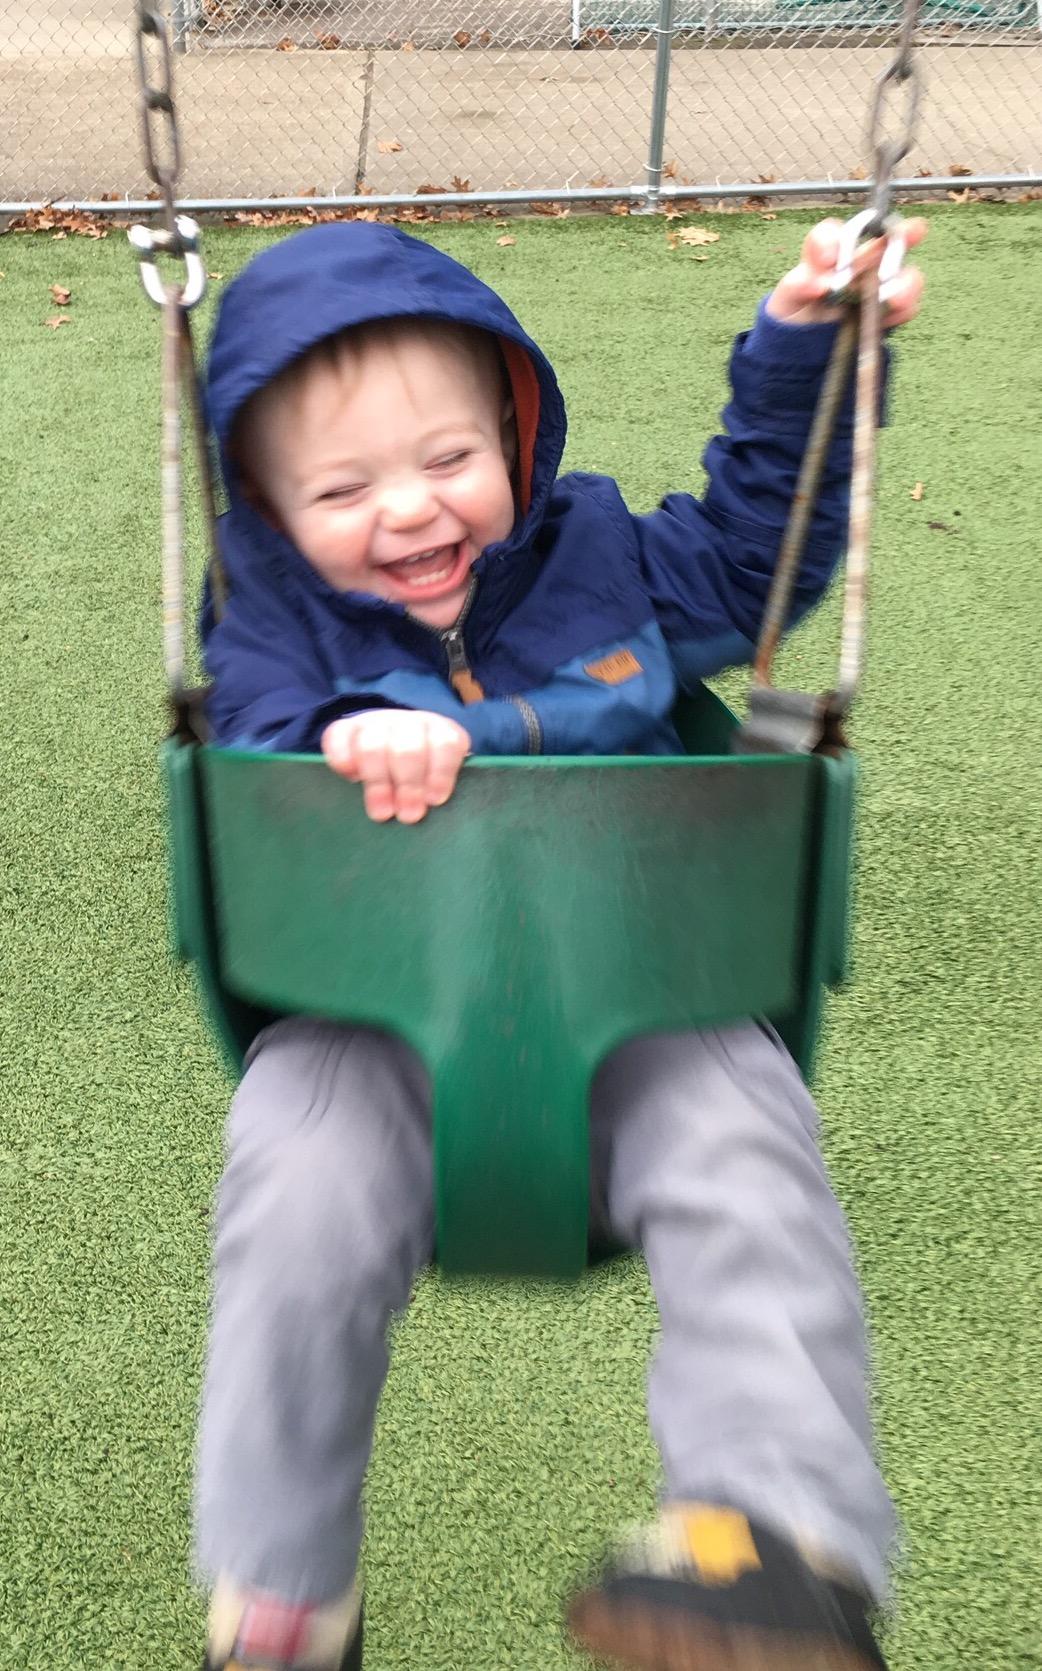 Julian laughs when he swings. Joshua just chills out.